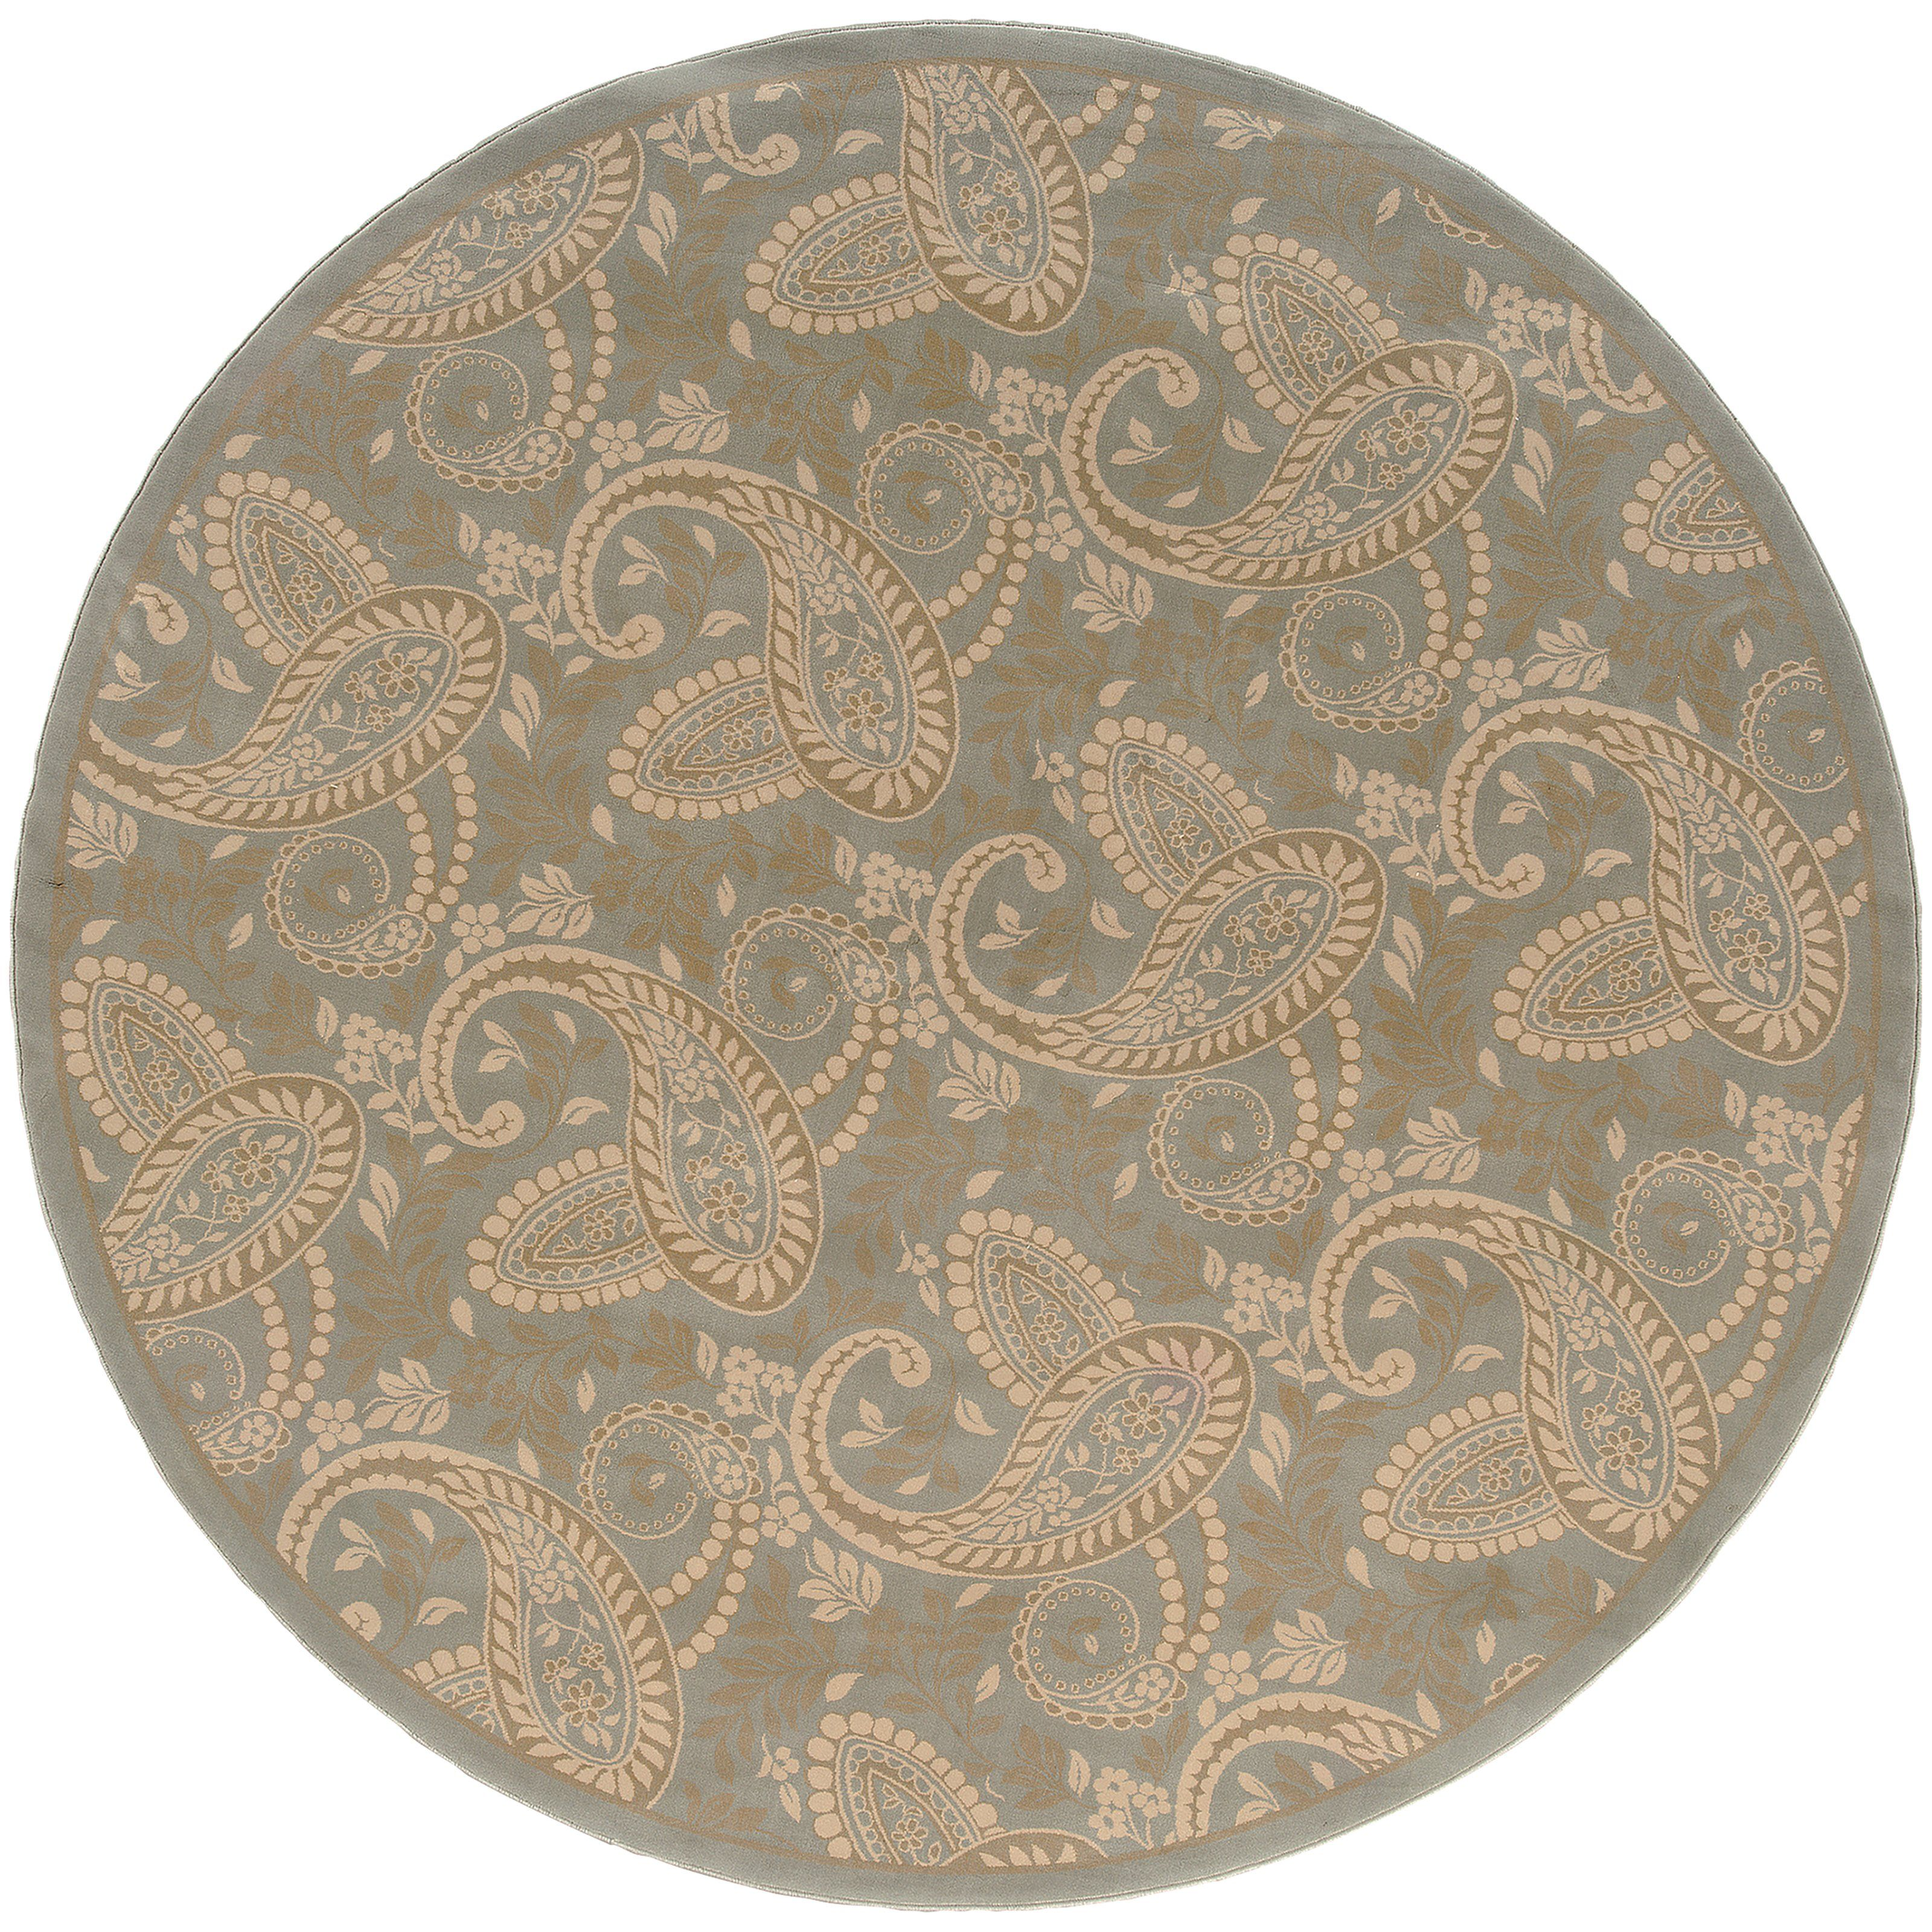 Oriental Weavers Ariana Blue/Gold Paisley 2284C Area Rug